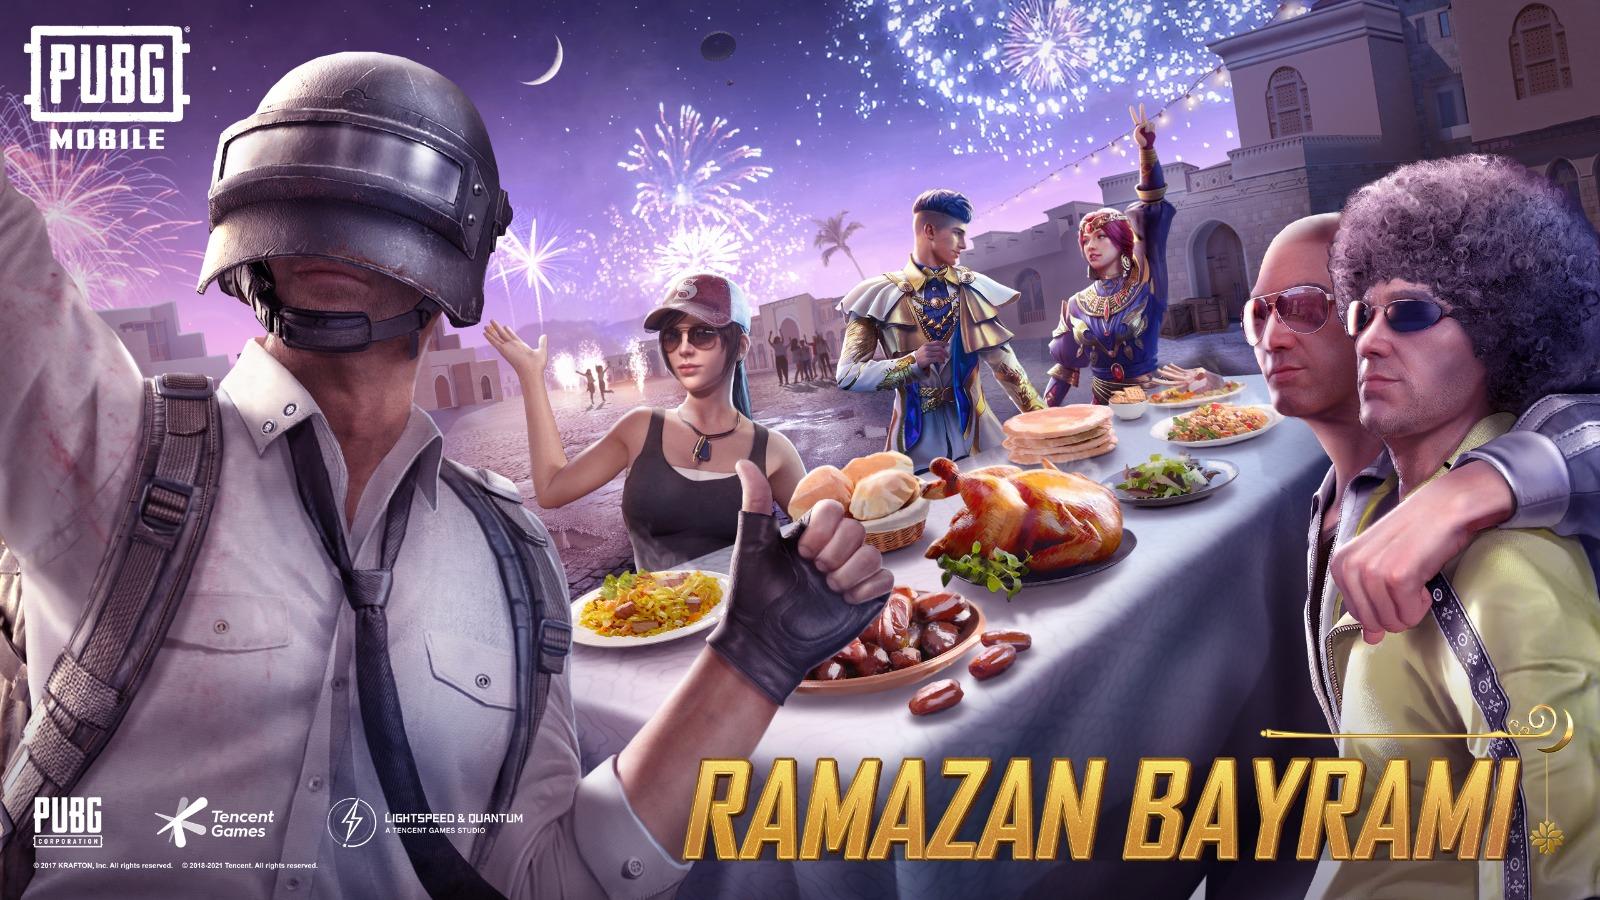 PUBG Mobile Ramazan